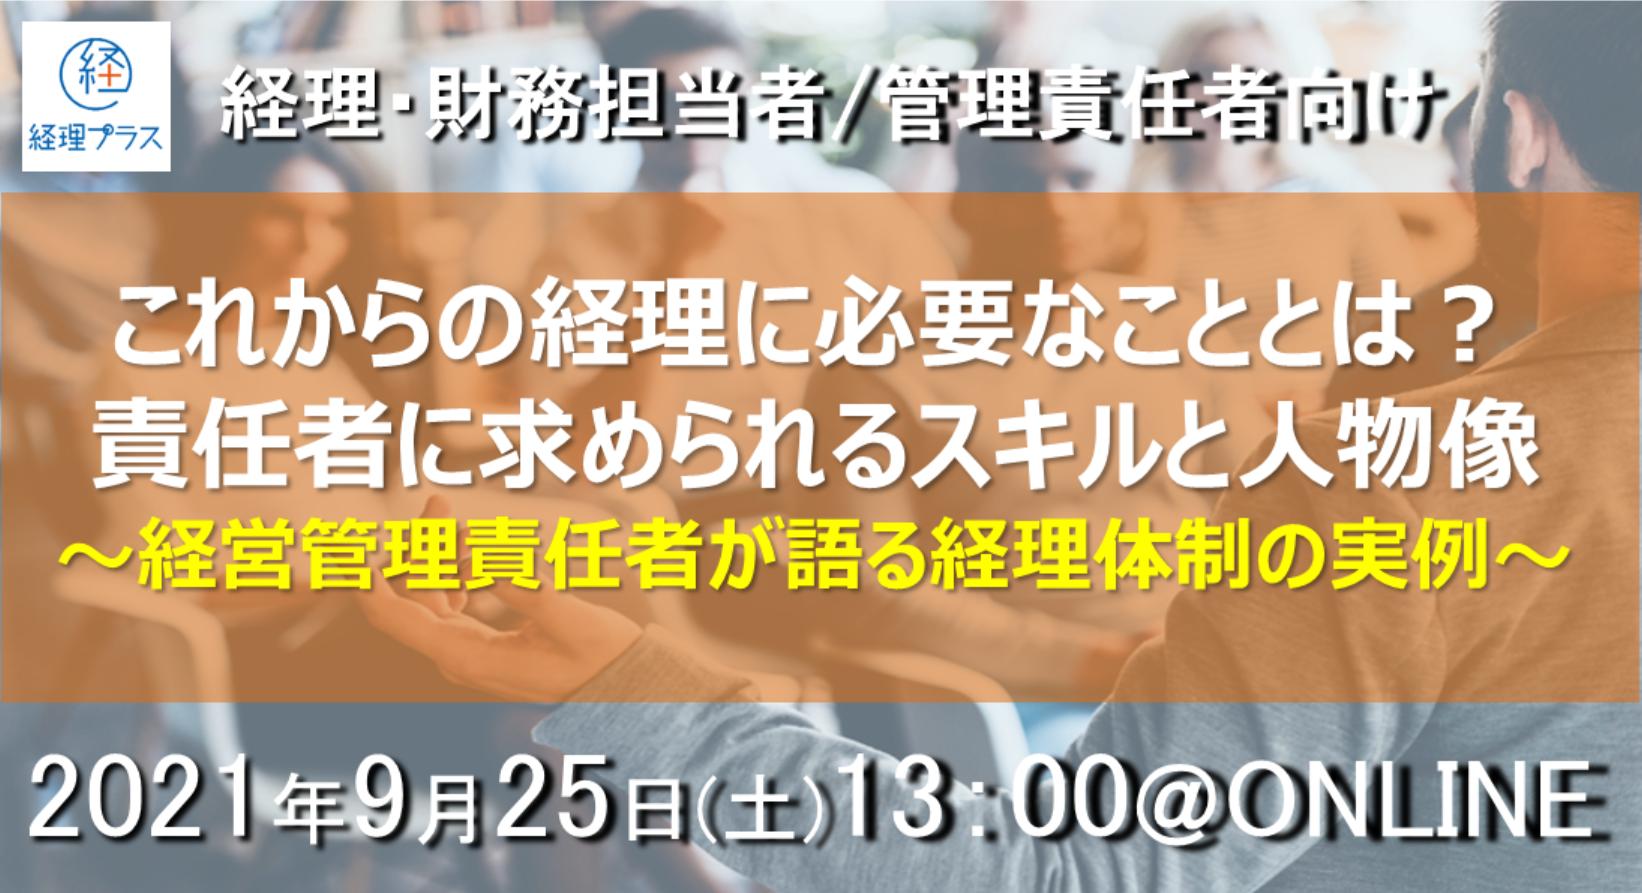 【好評受付中】経理勉強会@ONLINE~経営管理責任者が語る経理体制の実例〜